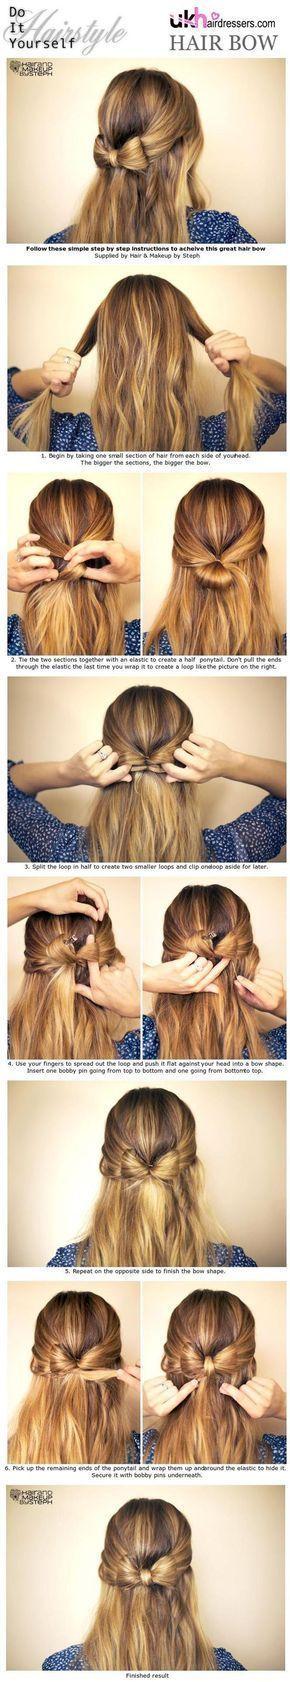 15 Süße 5-Minuten-Frisuren für die Schule, # 5Minute #Cute #Frisuren #Schule